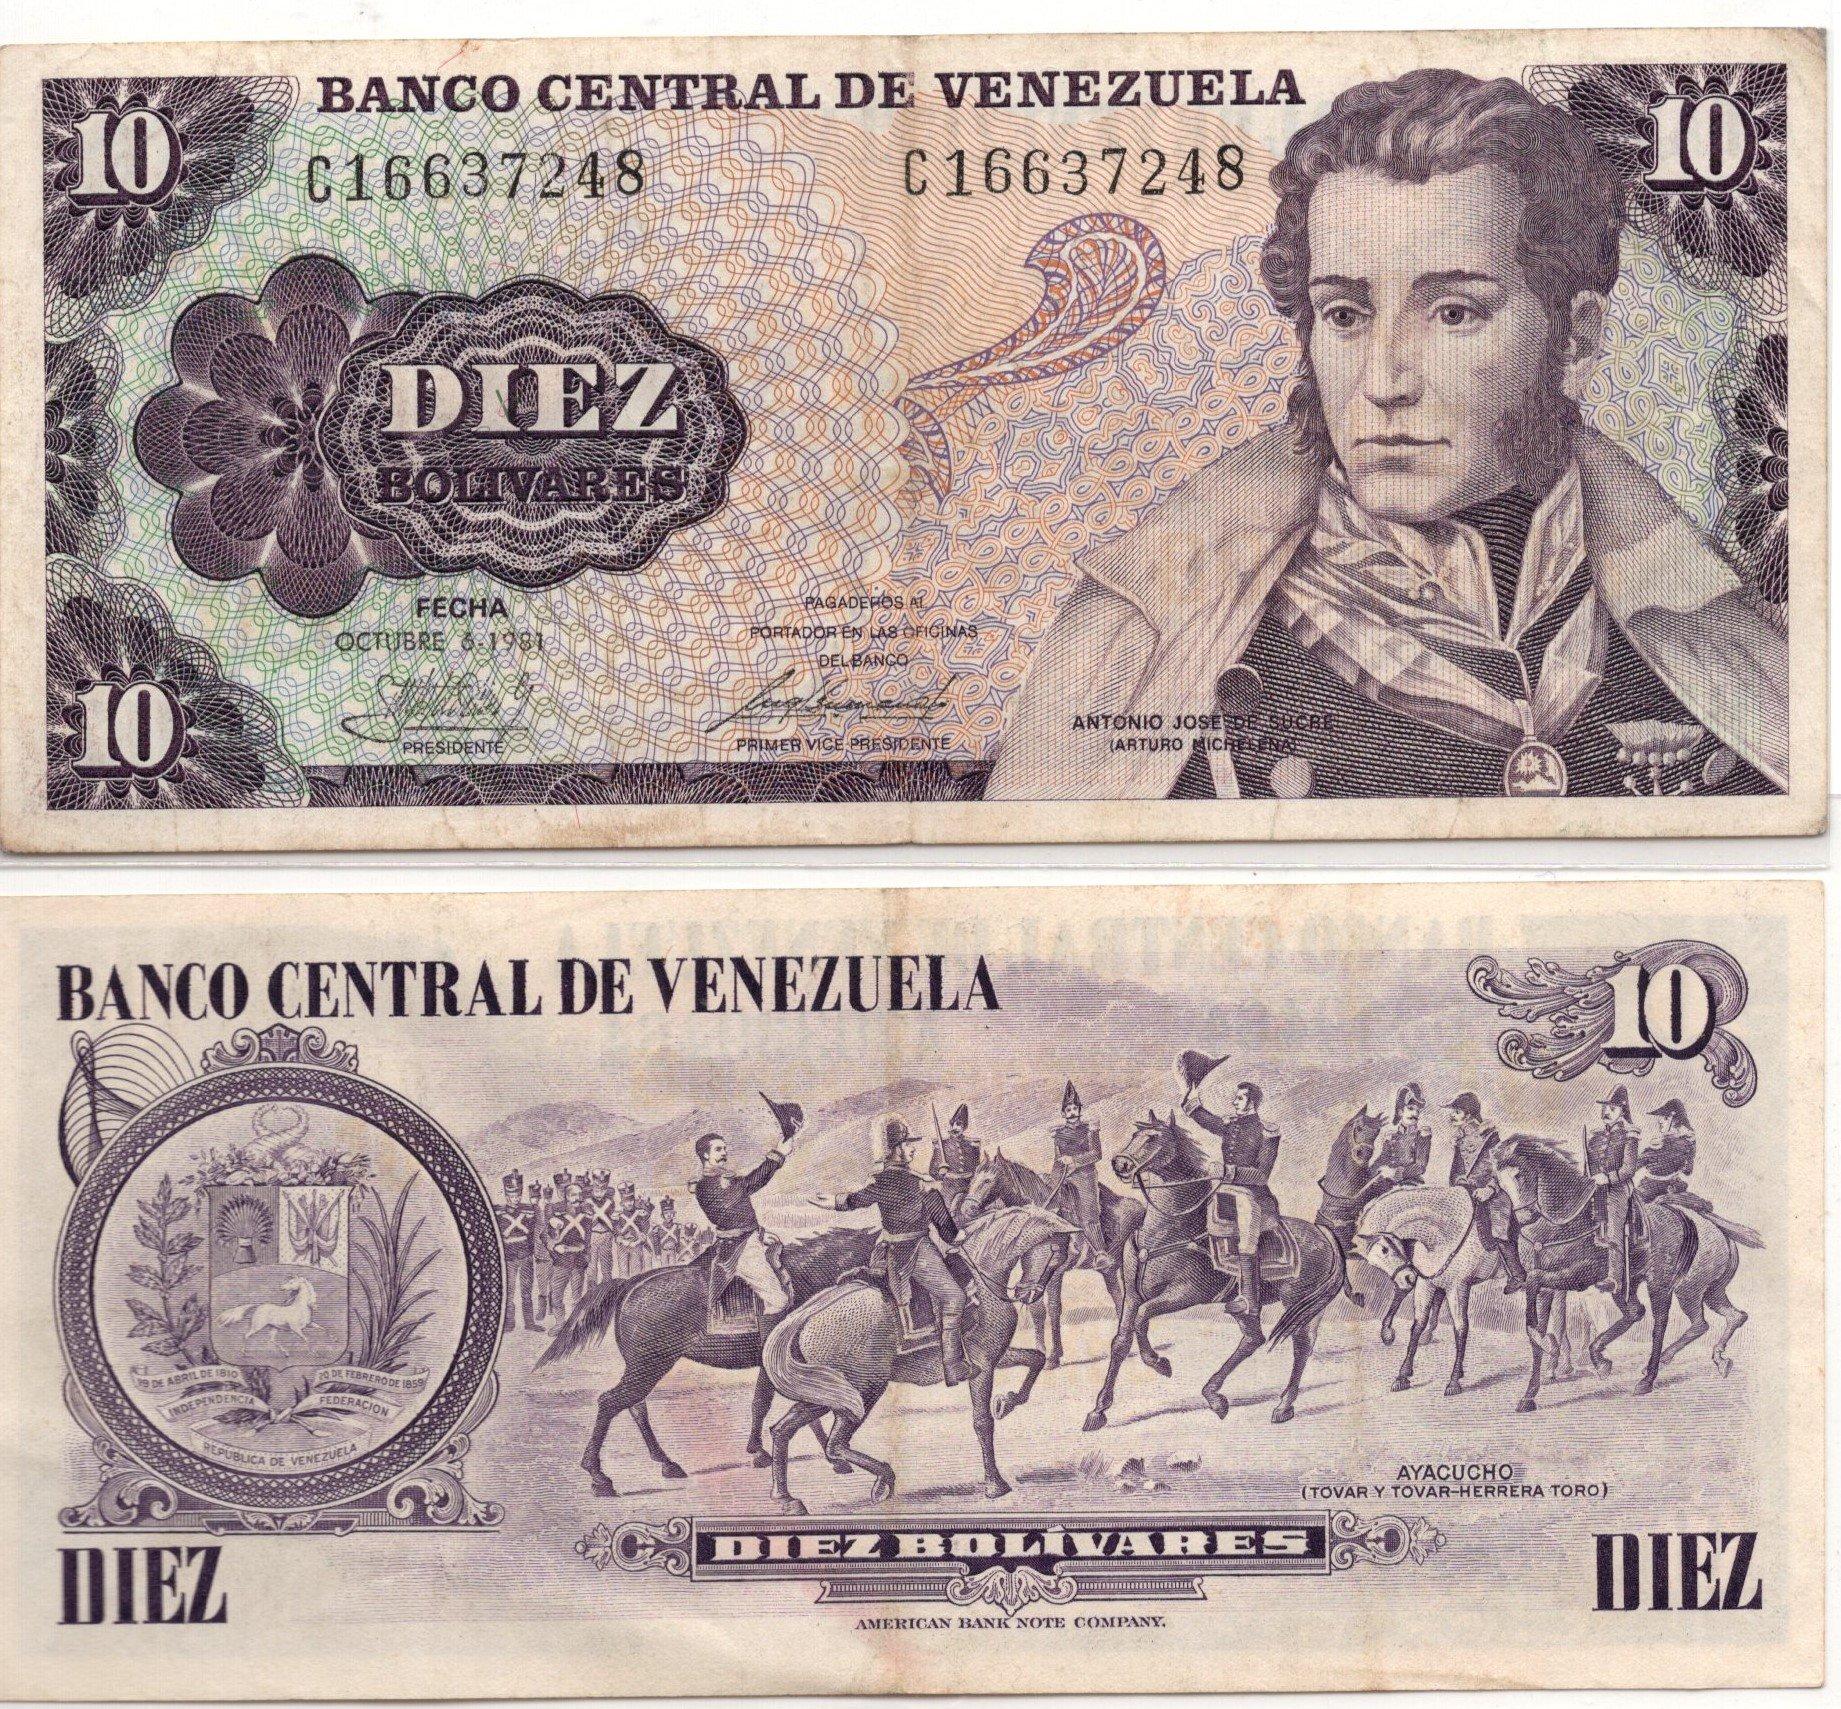 Venezuela 10 bolivares P60 banknote for sale